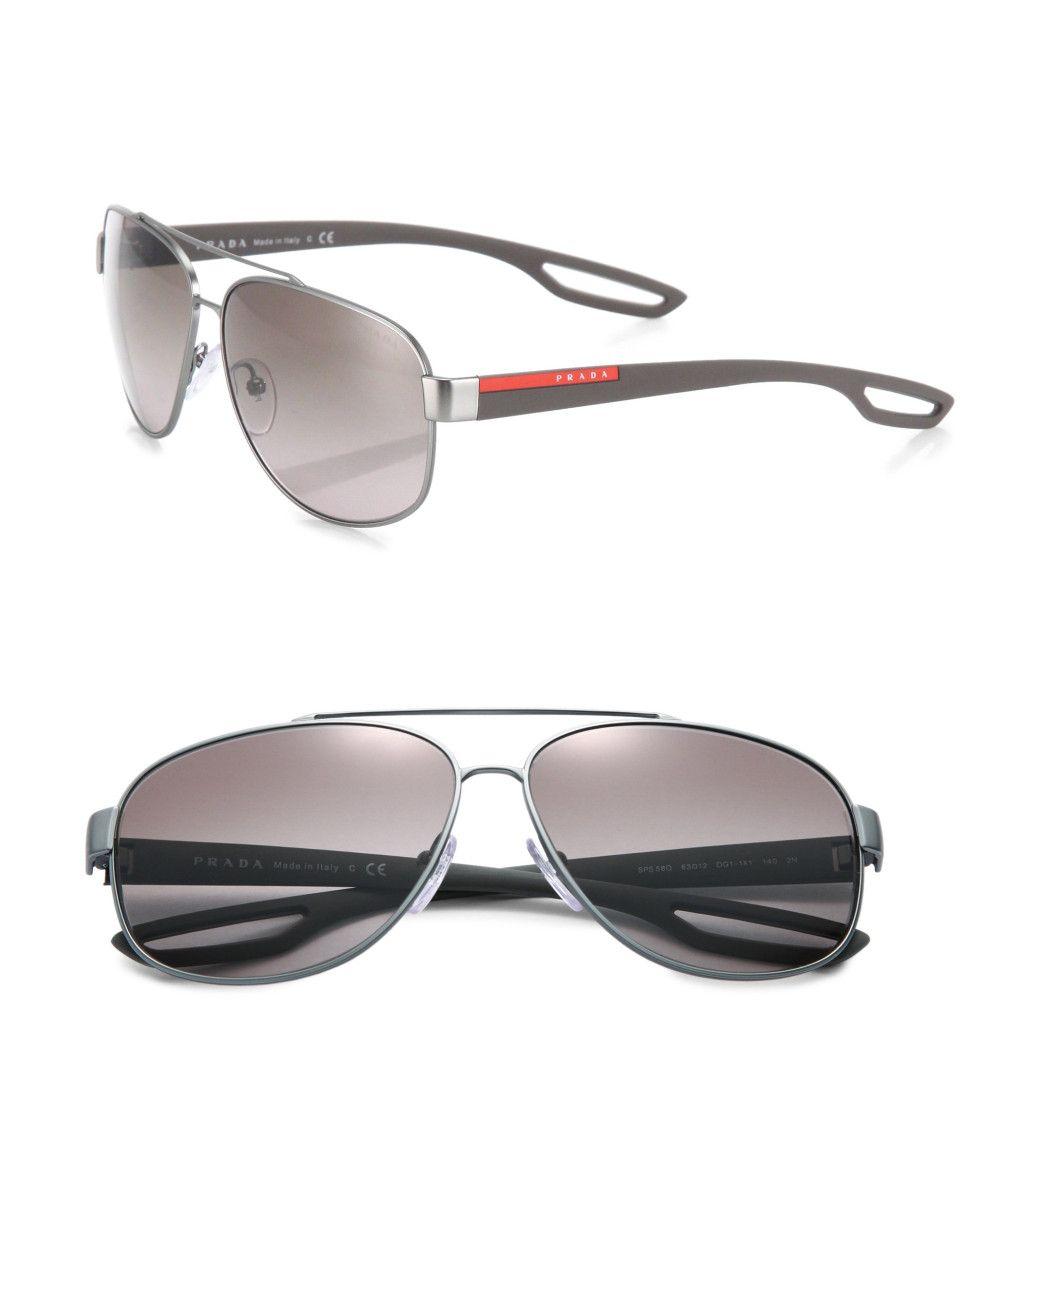 77d08b682121 Men s Metallic 63mm Rectangle Sunglasses